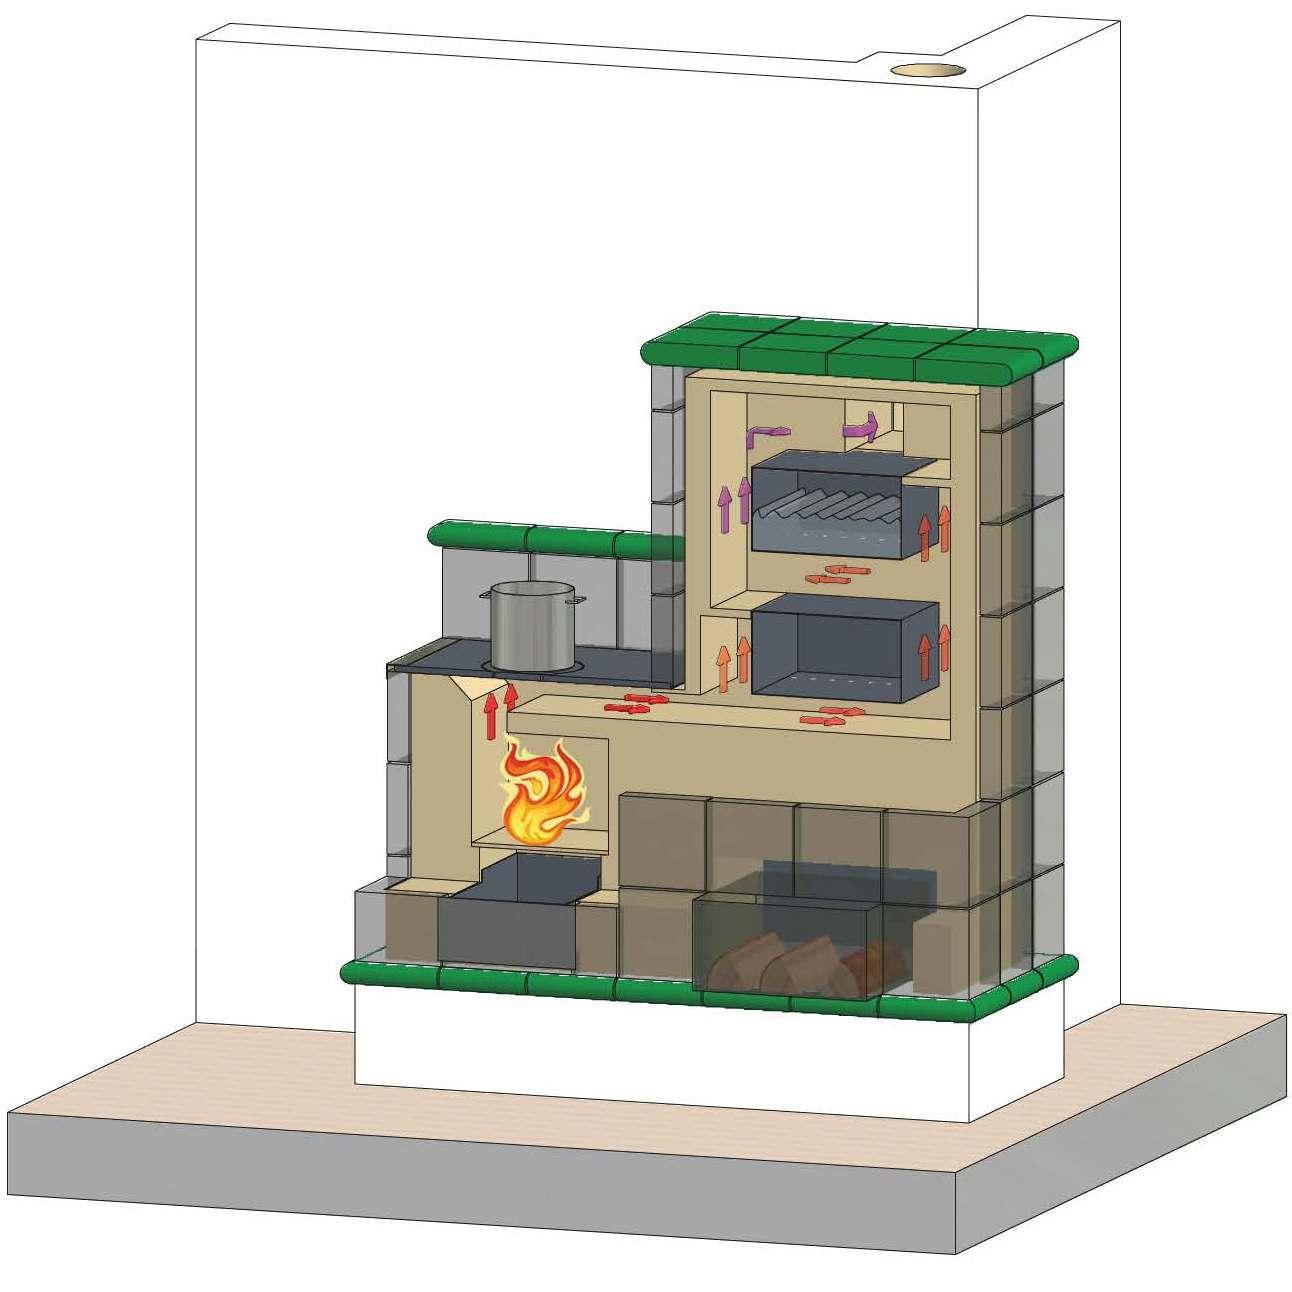 herd speicherherd kachelherd aufsatzherd durchheizherd tischherd. Black Bedroom Furniture Sets. Home Design Ideas